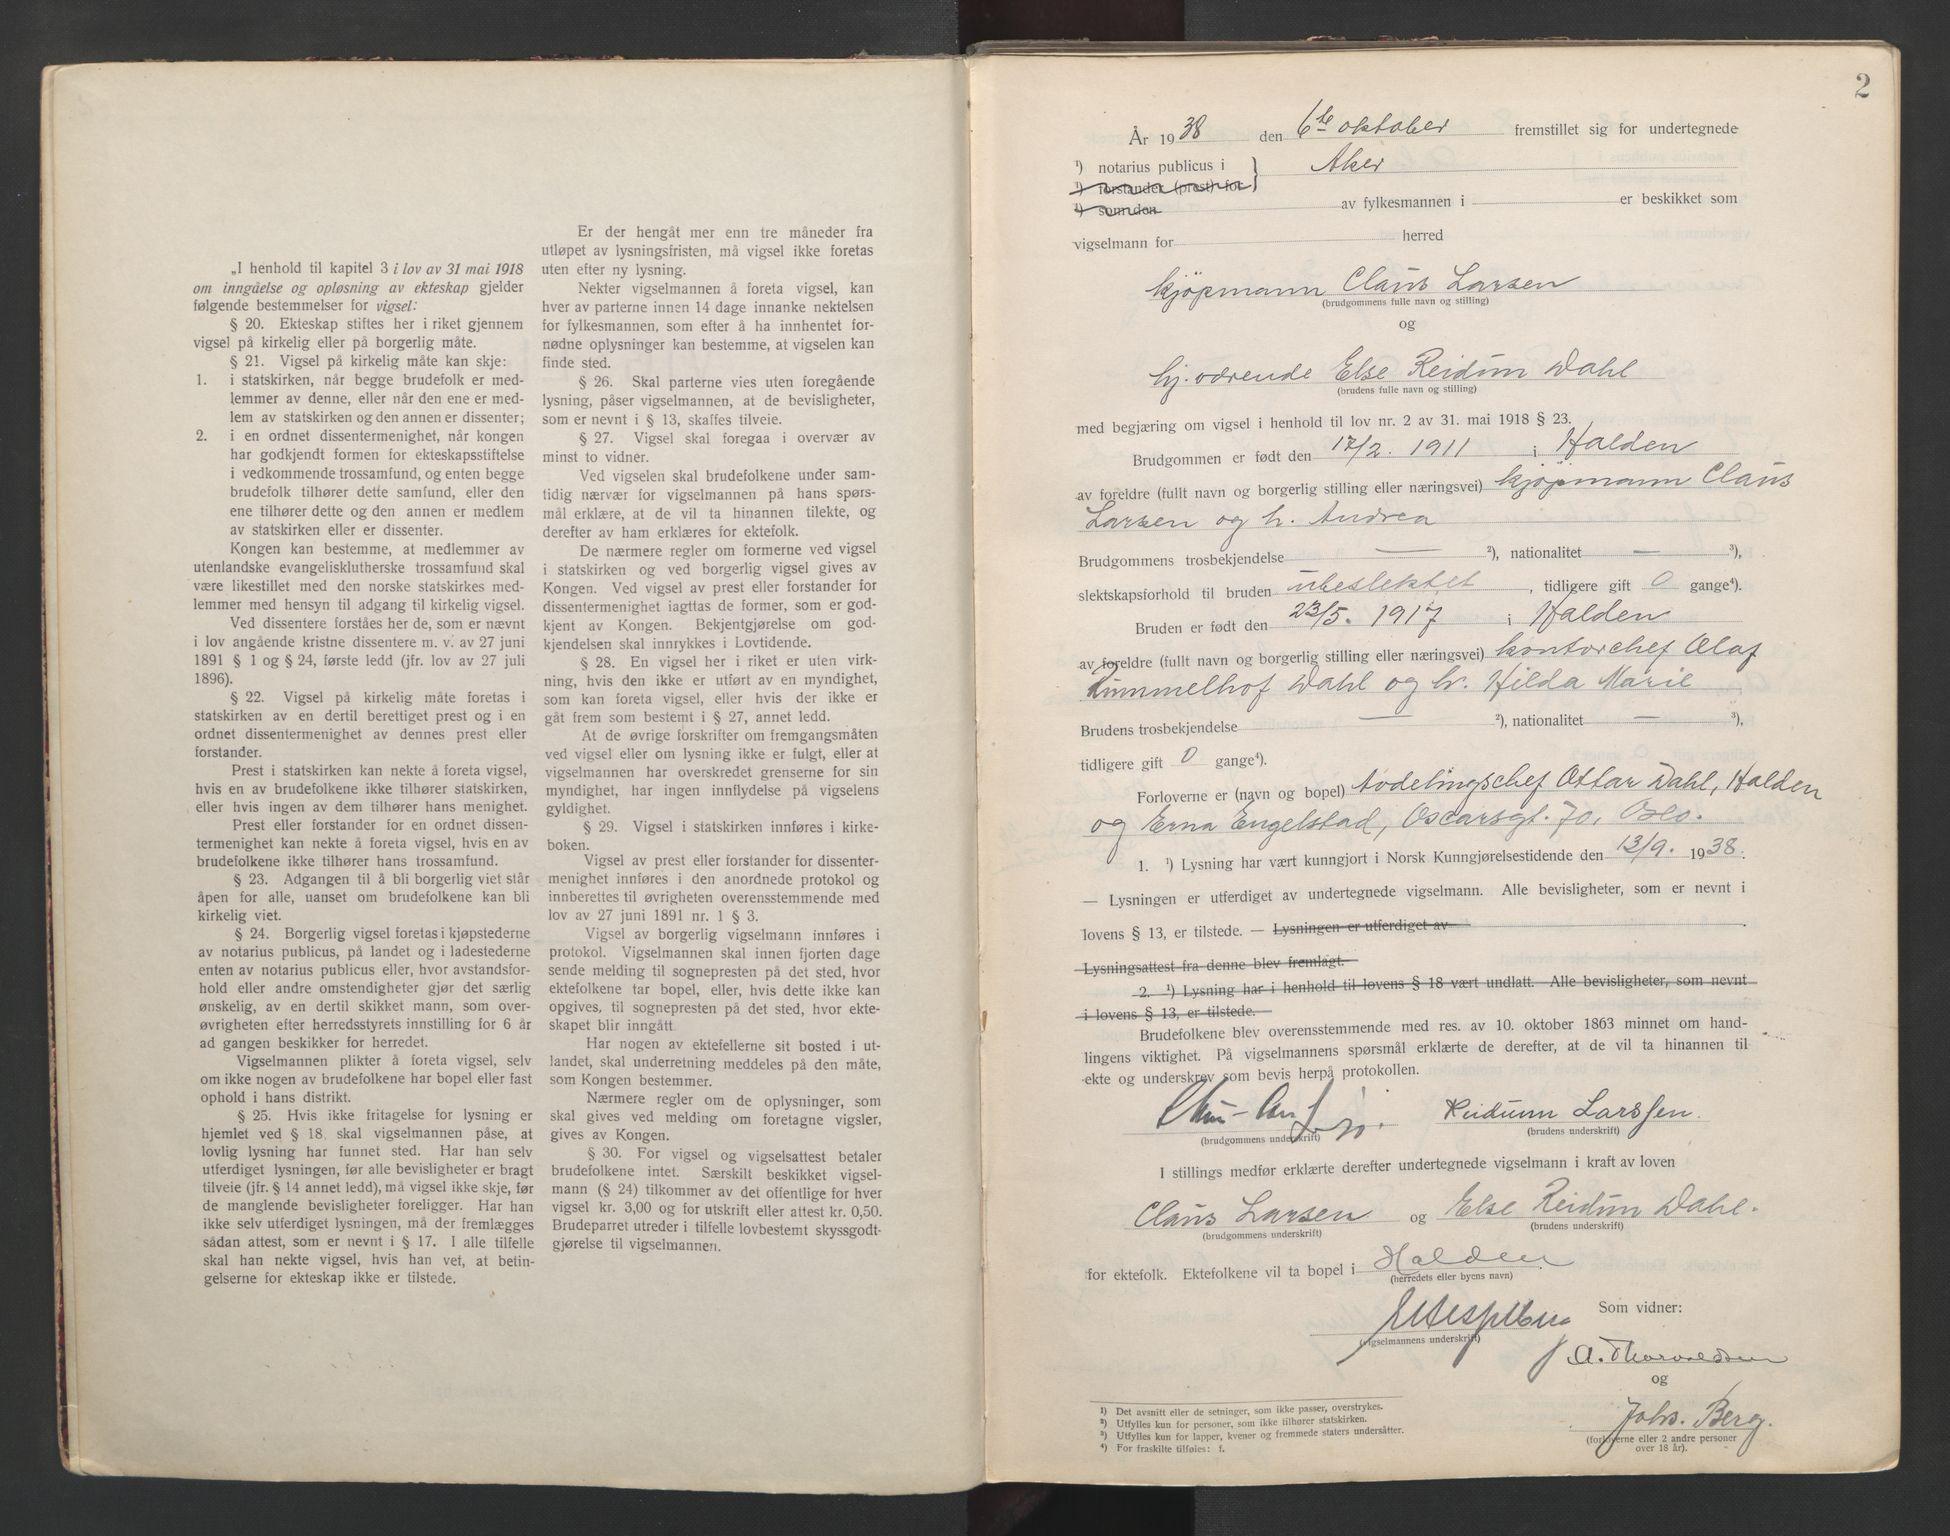 SAO, Aker sorenskriveri, L/Lc/Lcb/L0011: Vigselprotokoll, 1938-1939, s. 2